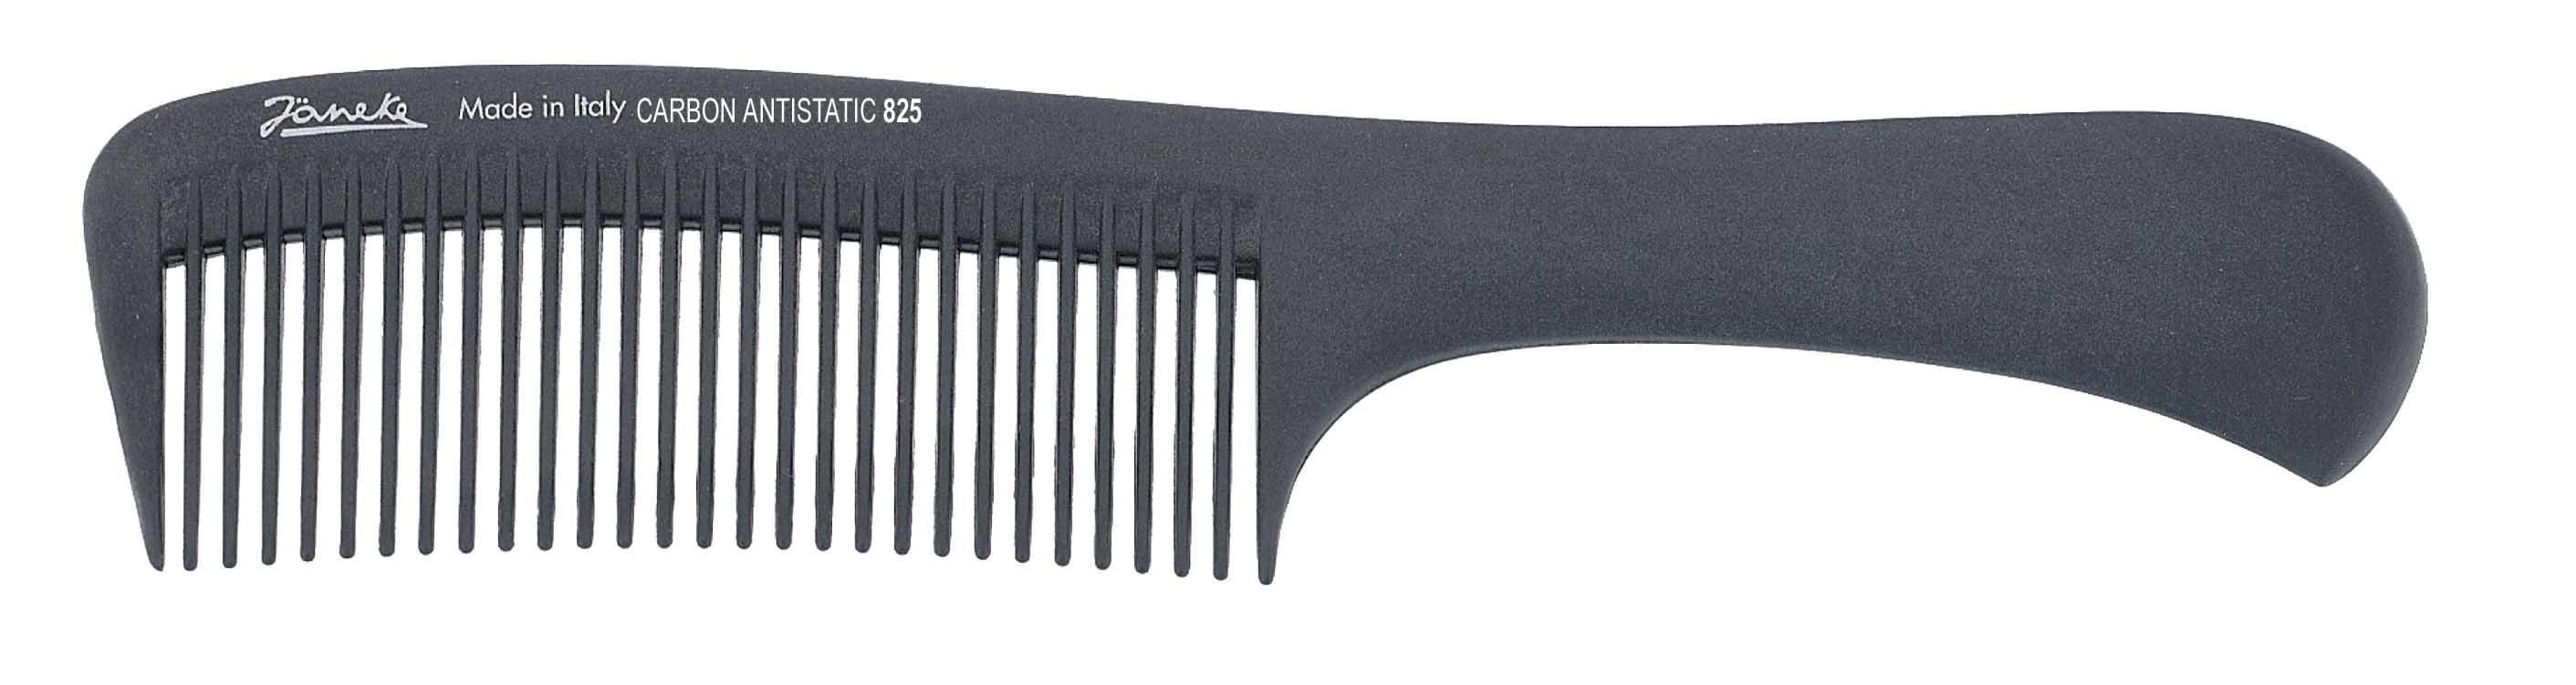 Handle comb for hair colour application 22,5 cm Cod. 55825